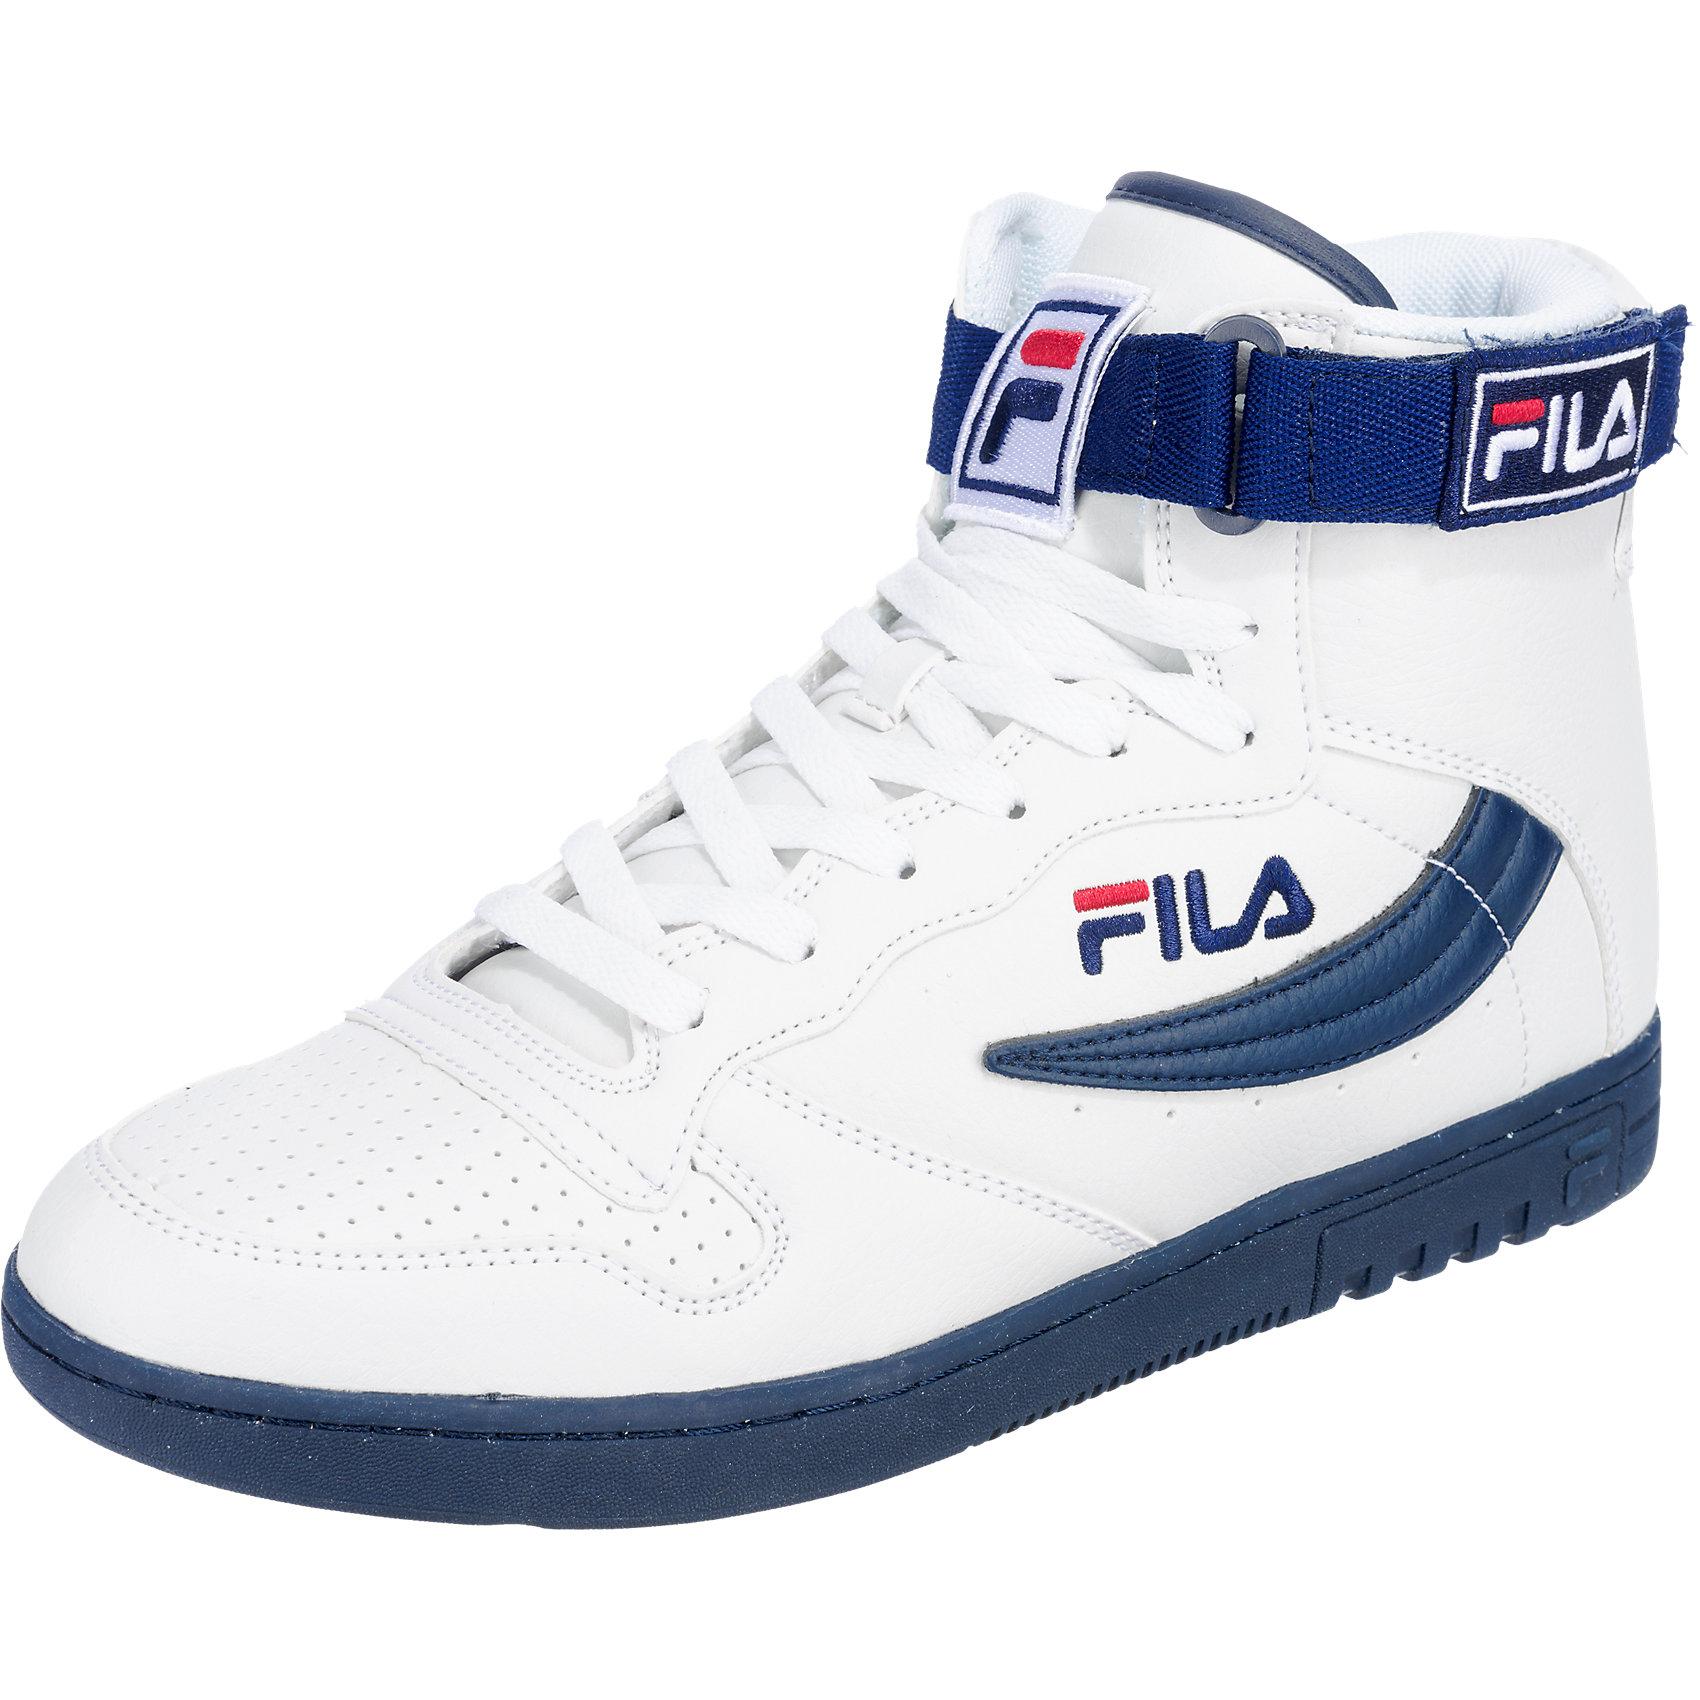 Neu-FILA-Fx-100-Sneakers-weiss-kombi-5773388